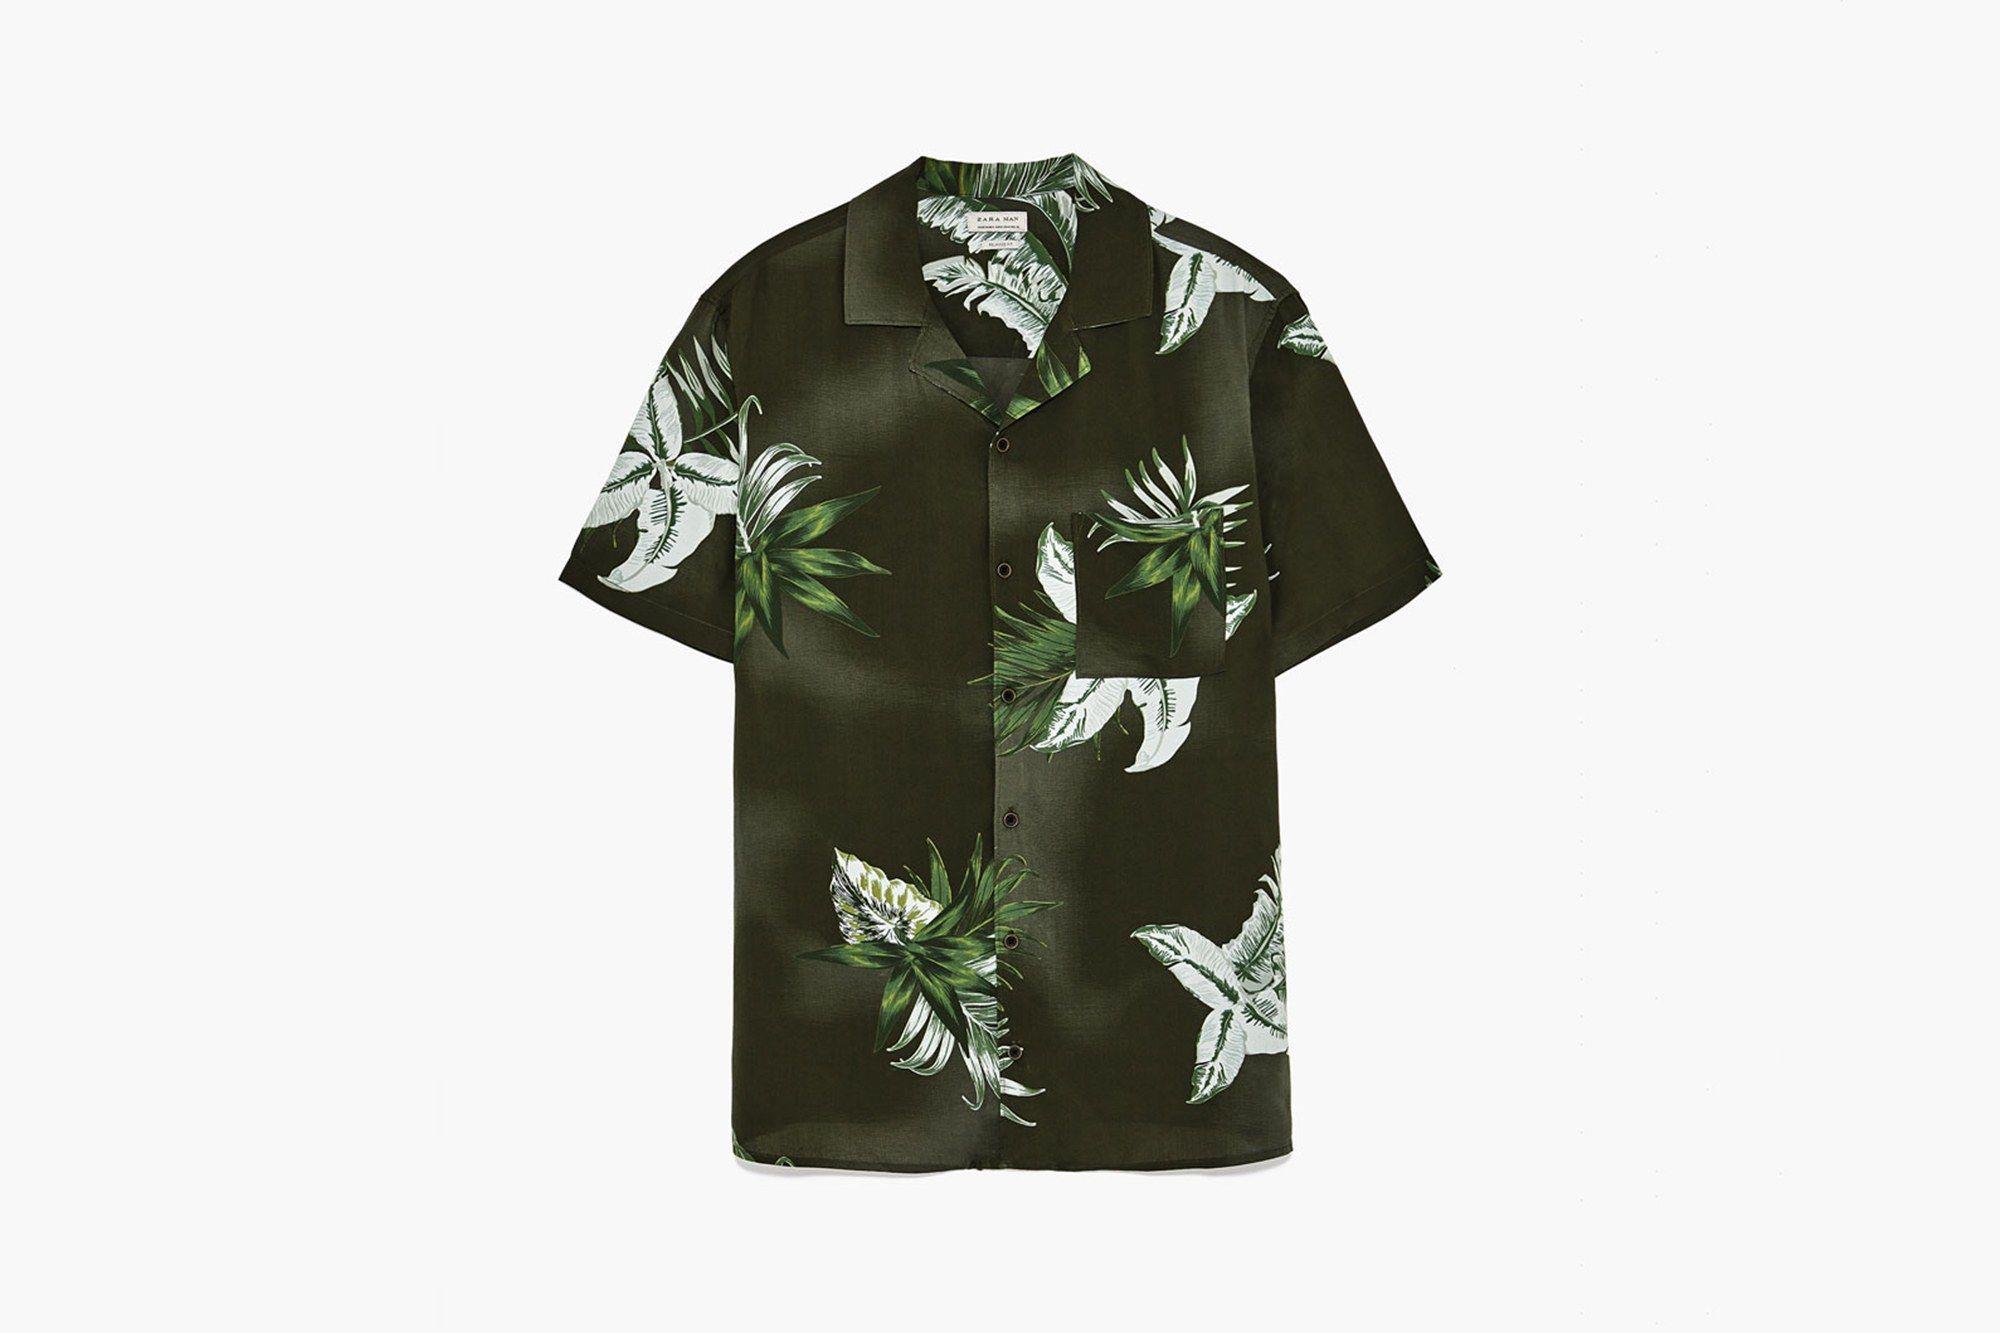 700dc02e Every Hawaiian Shirt You Should Buy Now and Wear All Summer Long Photos | GQ